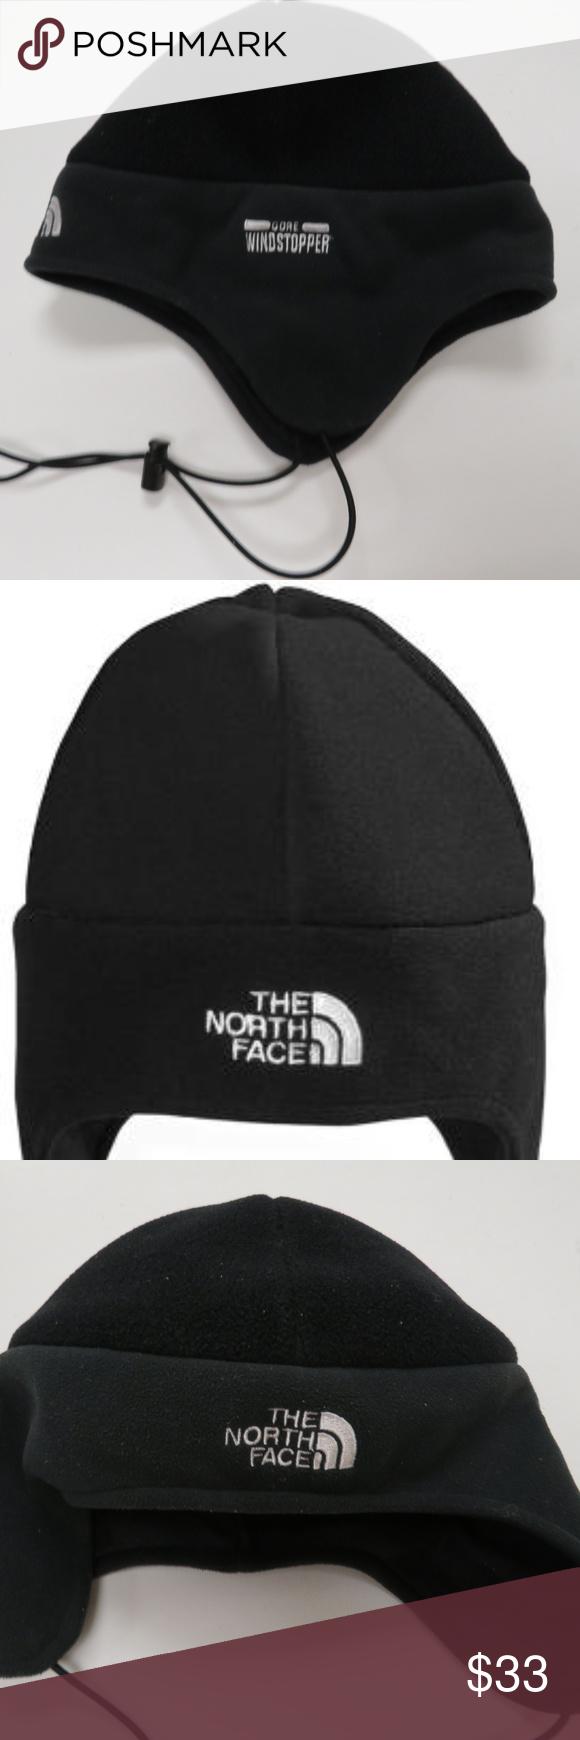 20189f25b canada north face windstopper hat 97802 8cabb